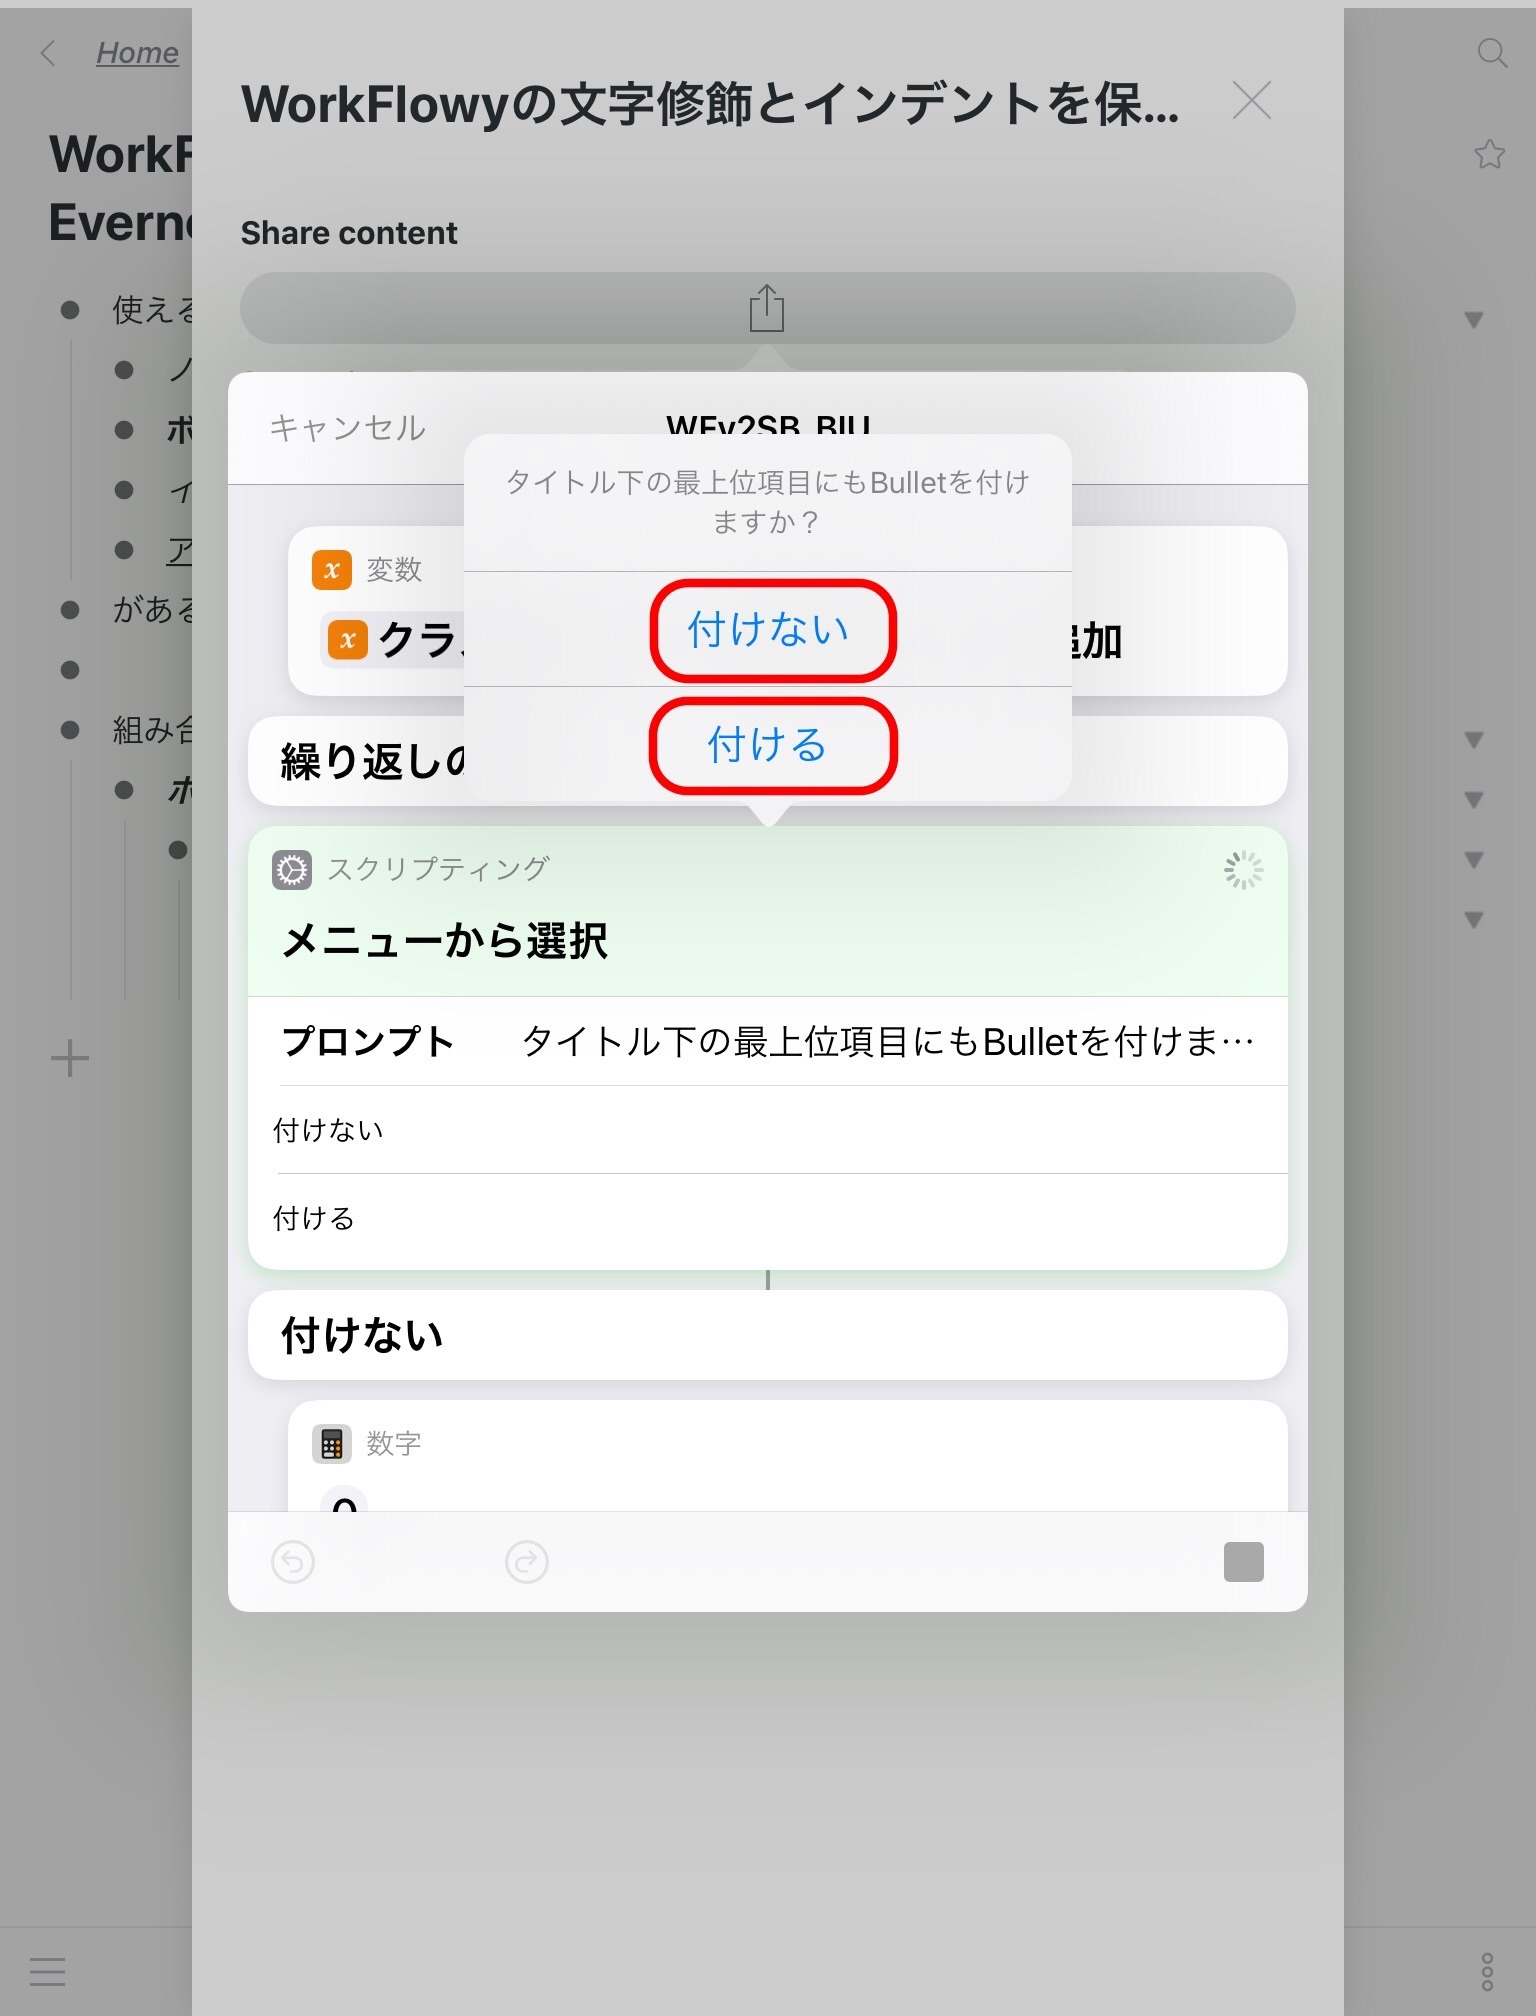 f:id:sorashima:20200731233155j:plain:w637